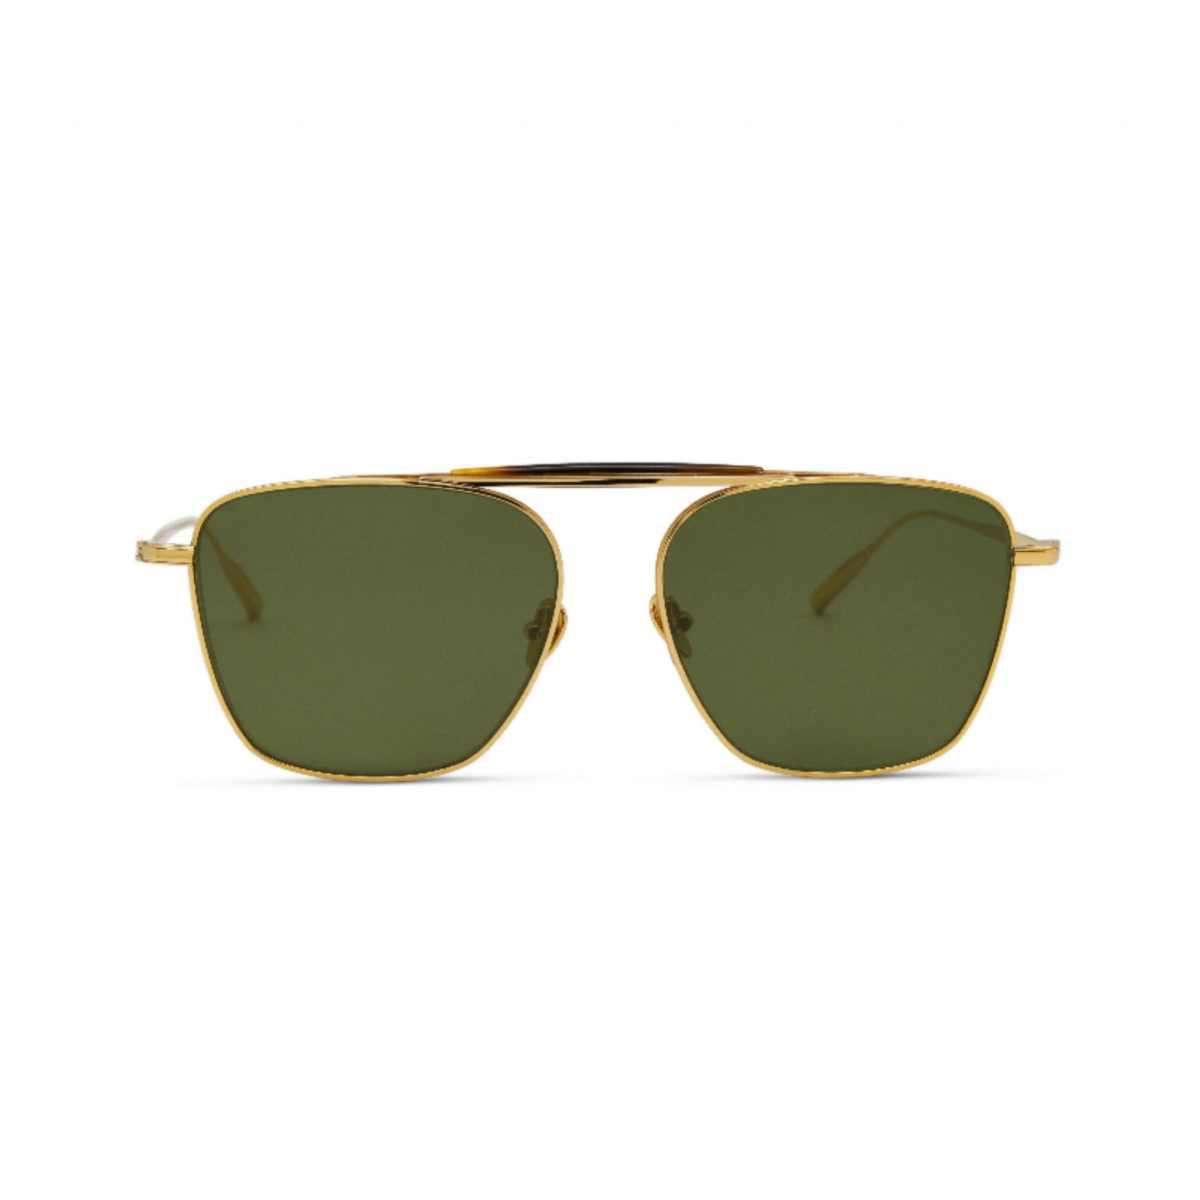 BENJAMIN - 18K Gold Aerospace Titanium Frame with Solid Green Lens by Amavii, available on amavii.com for $225 Gigi Hadid Sunglasses Exact Product